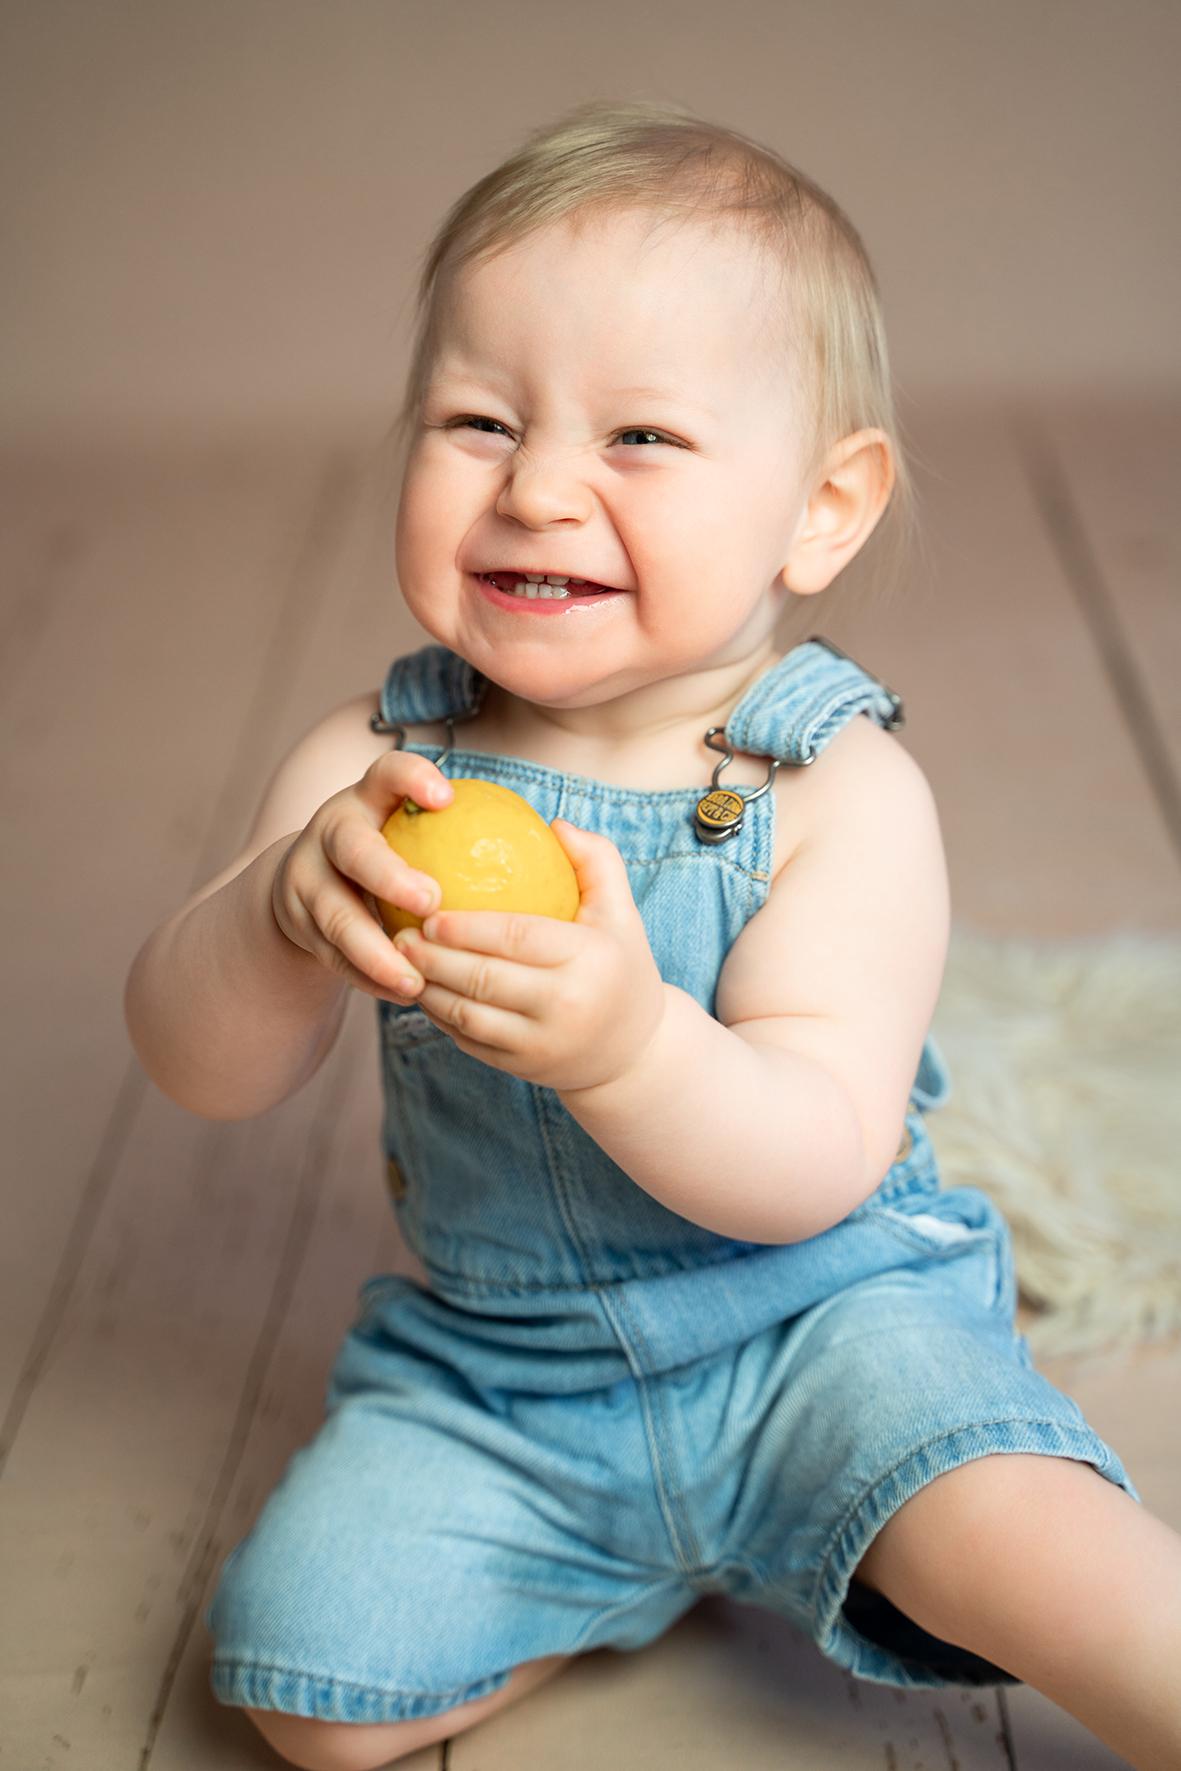 Fotograf Grasberg Fotoshooting Kinder und Babys